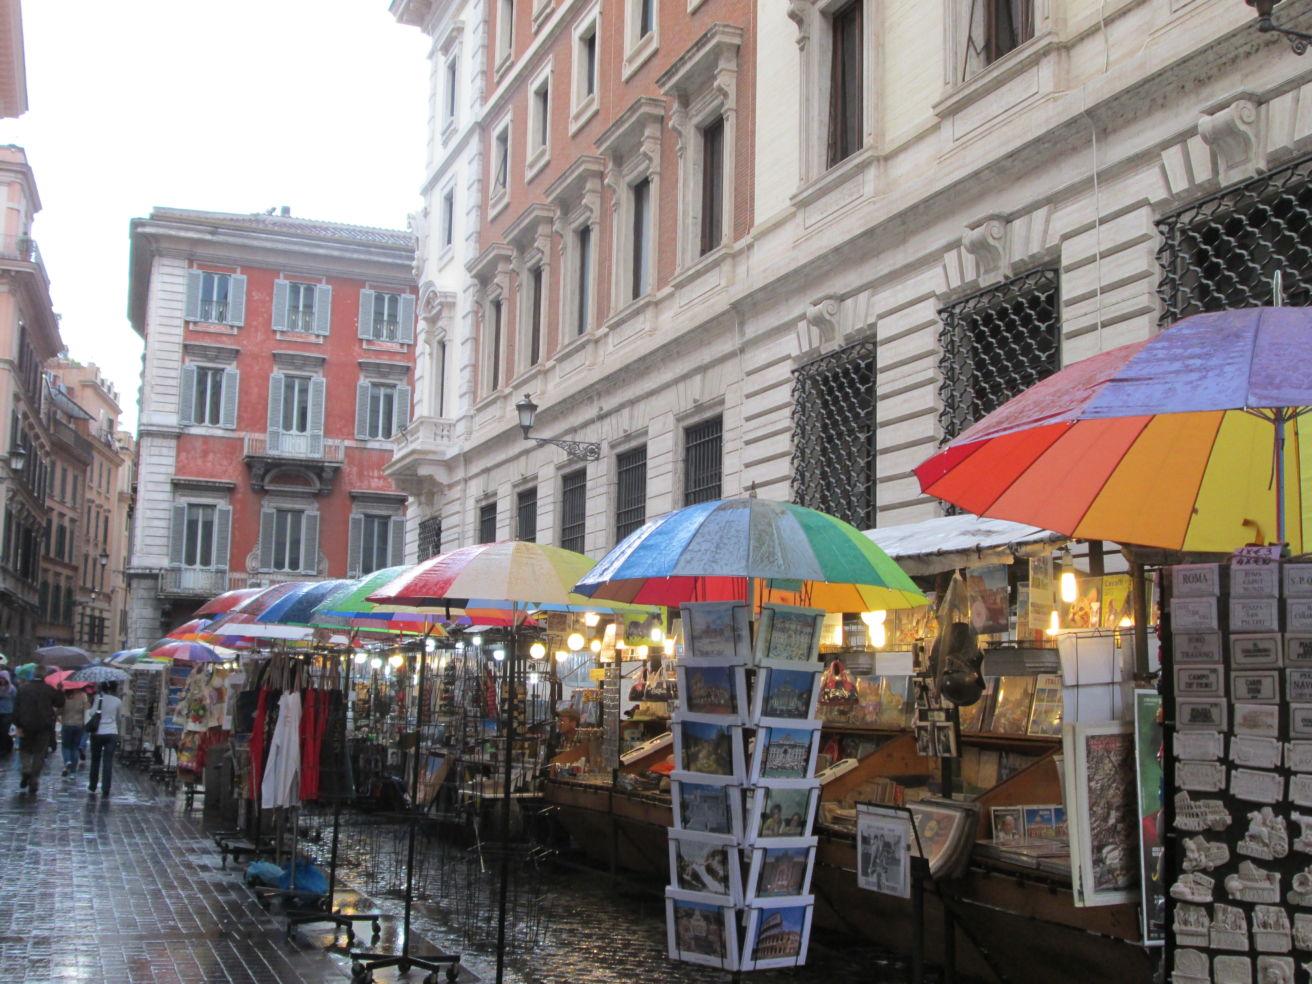 Vendors in Rome, Italy